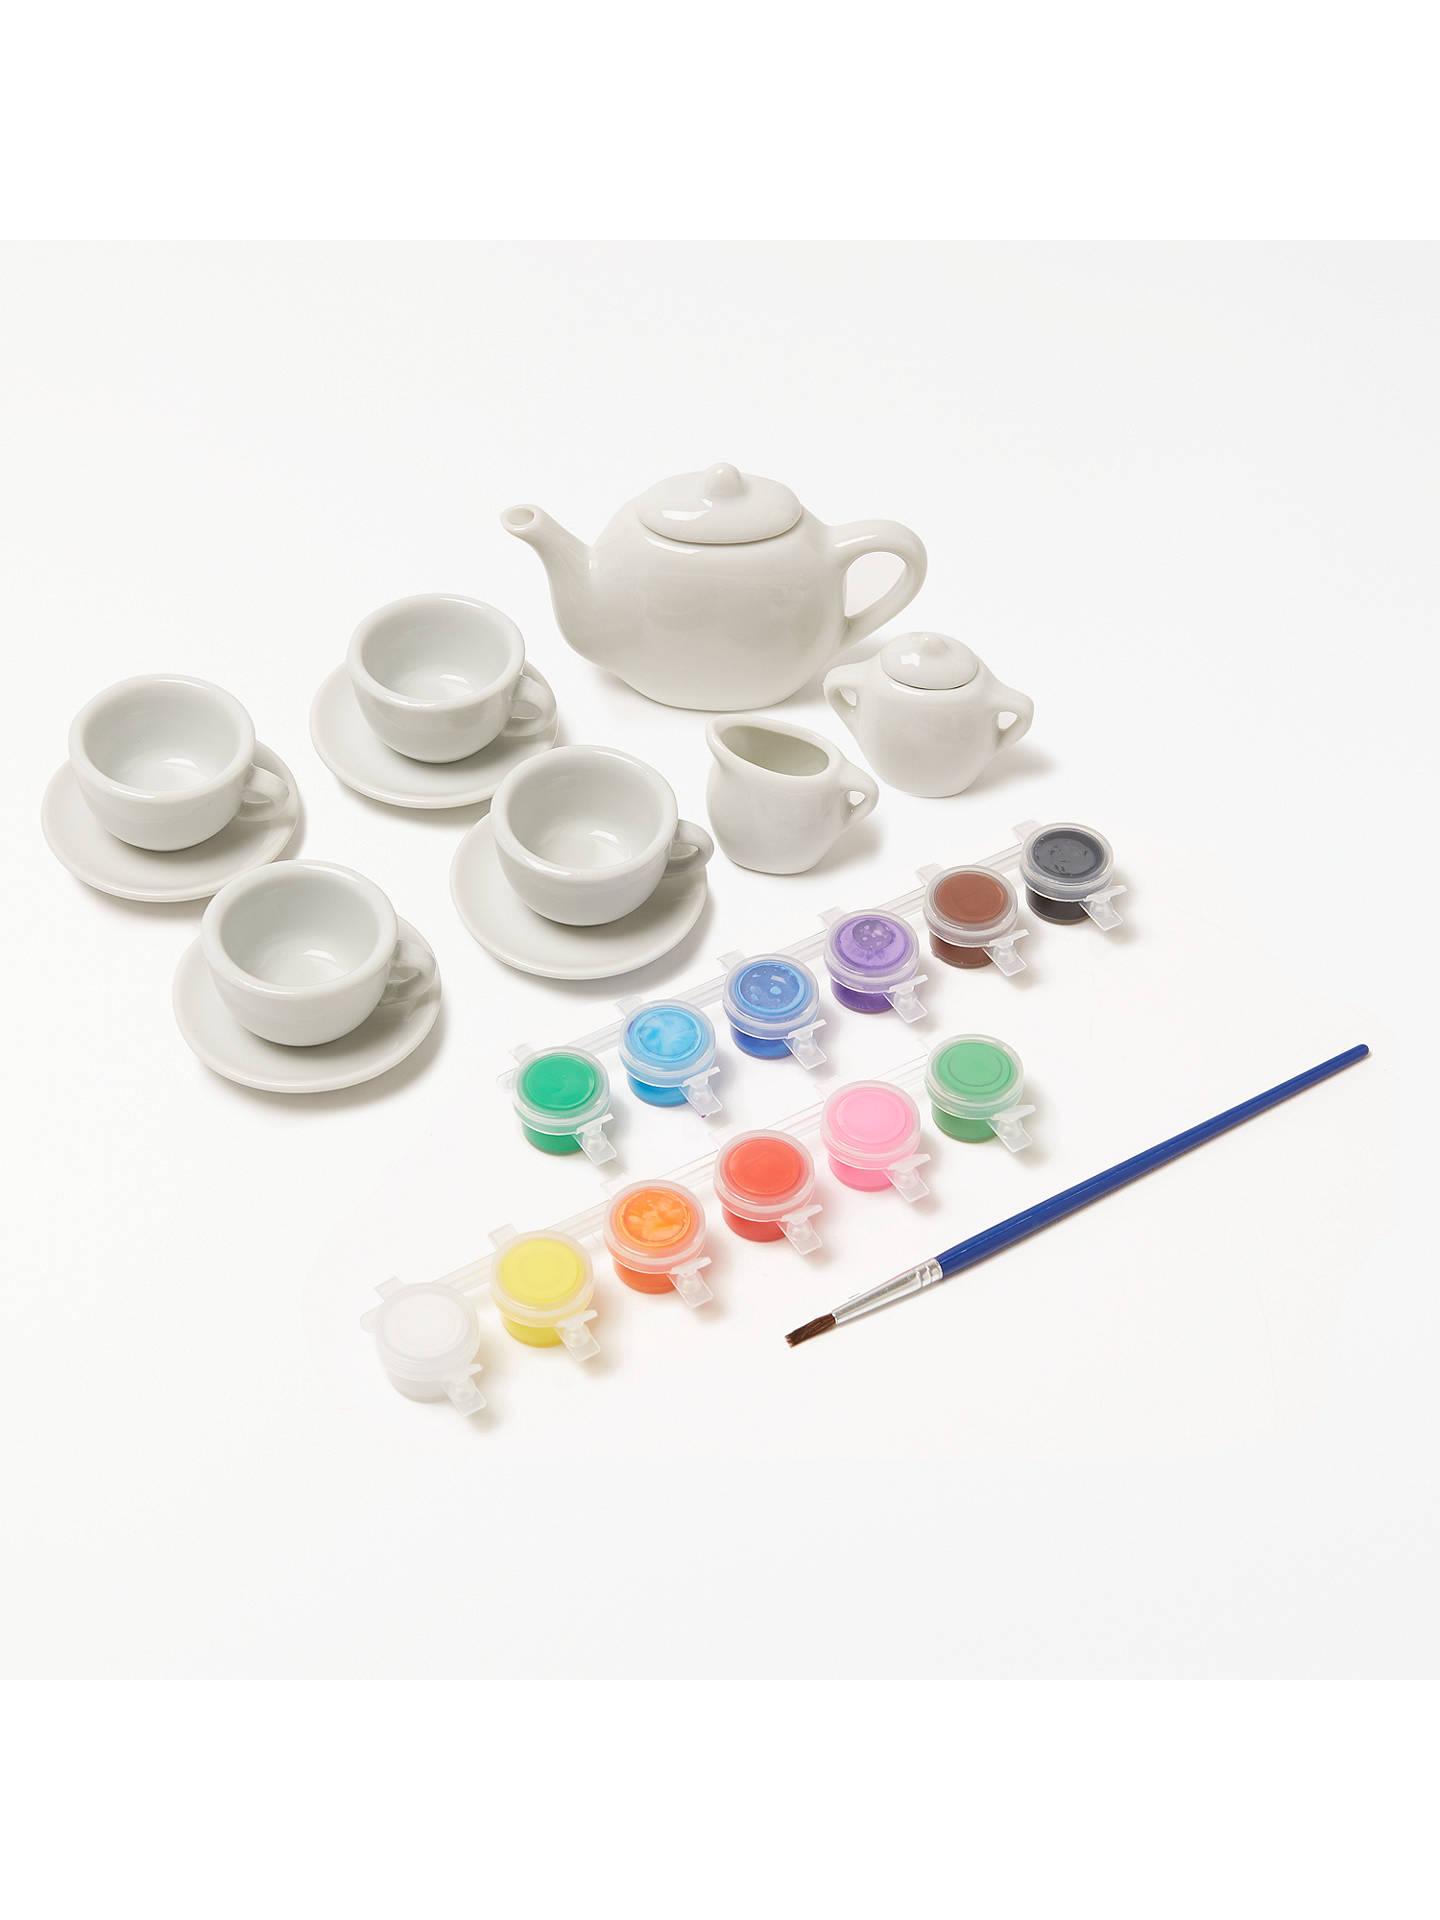 BuyJohn Lewis & Partners Paint Your Own Teapot Set Online at johnlewis. ...